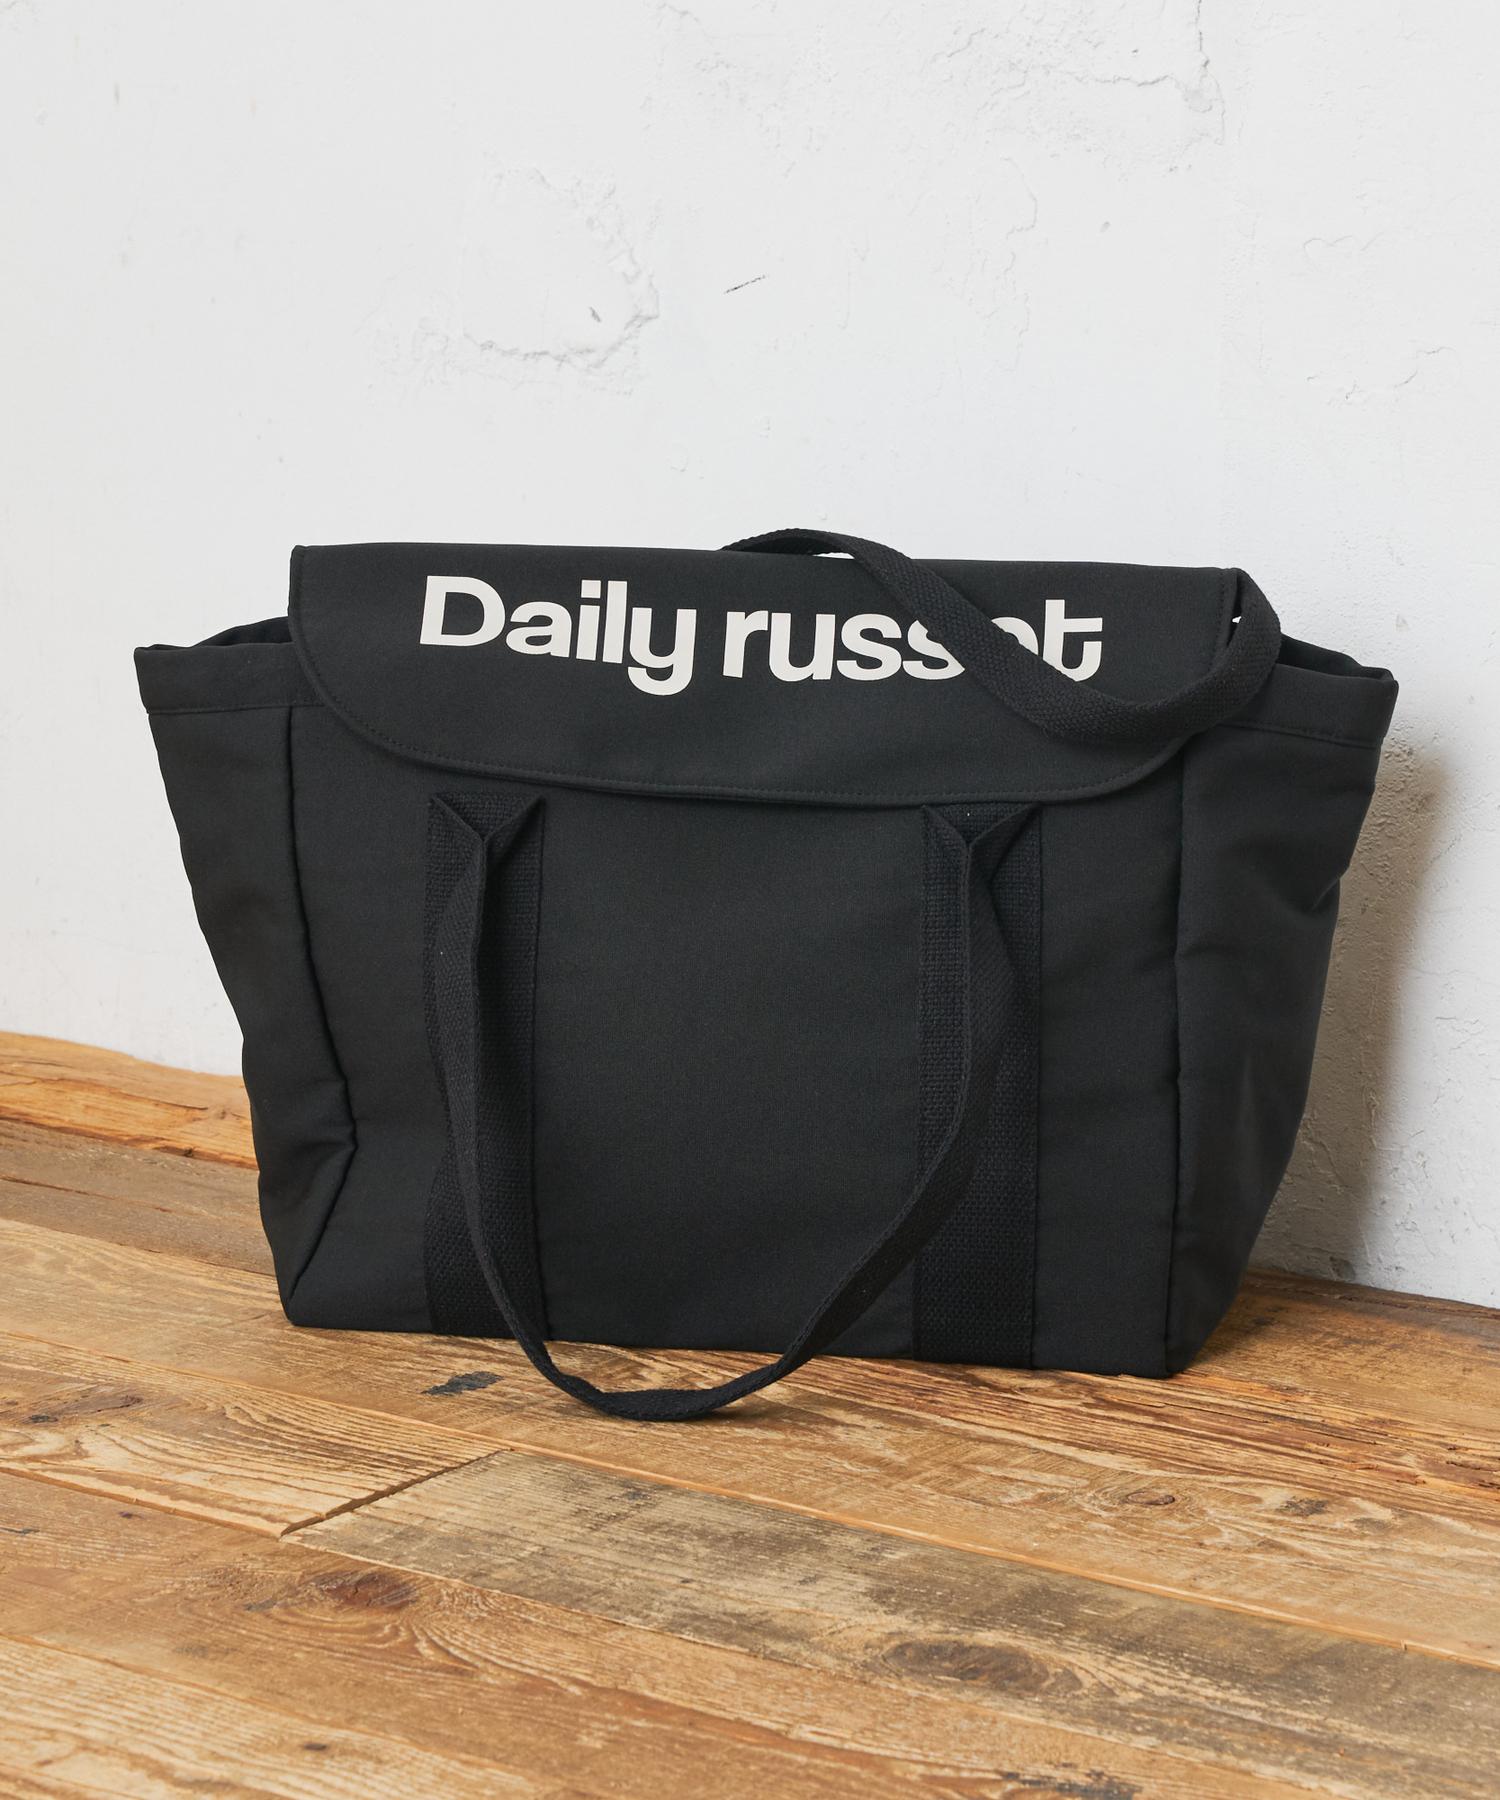 Daily russet(デイリー ラシット) 【大容量】ロゴフラップトートバッグ(L)